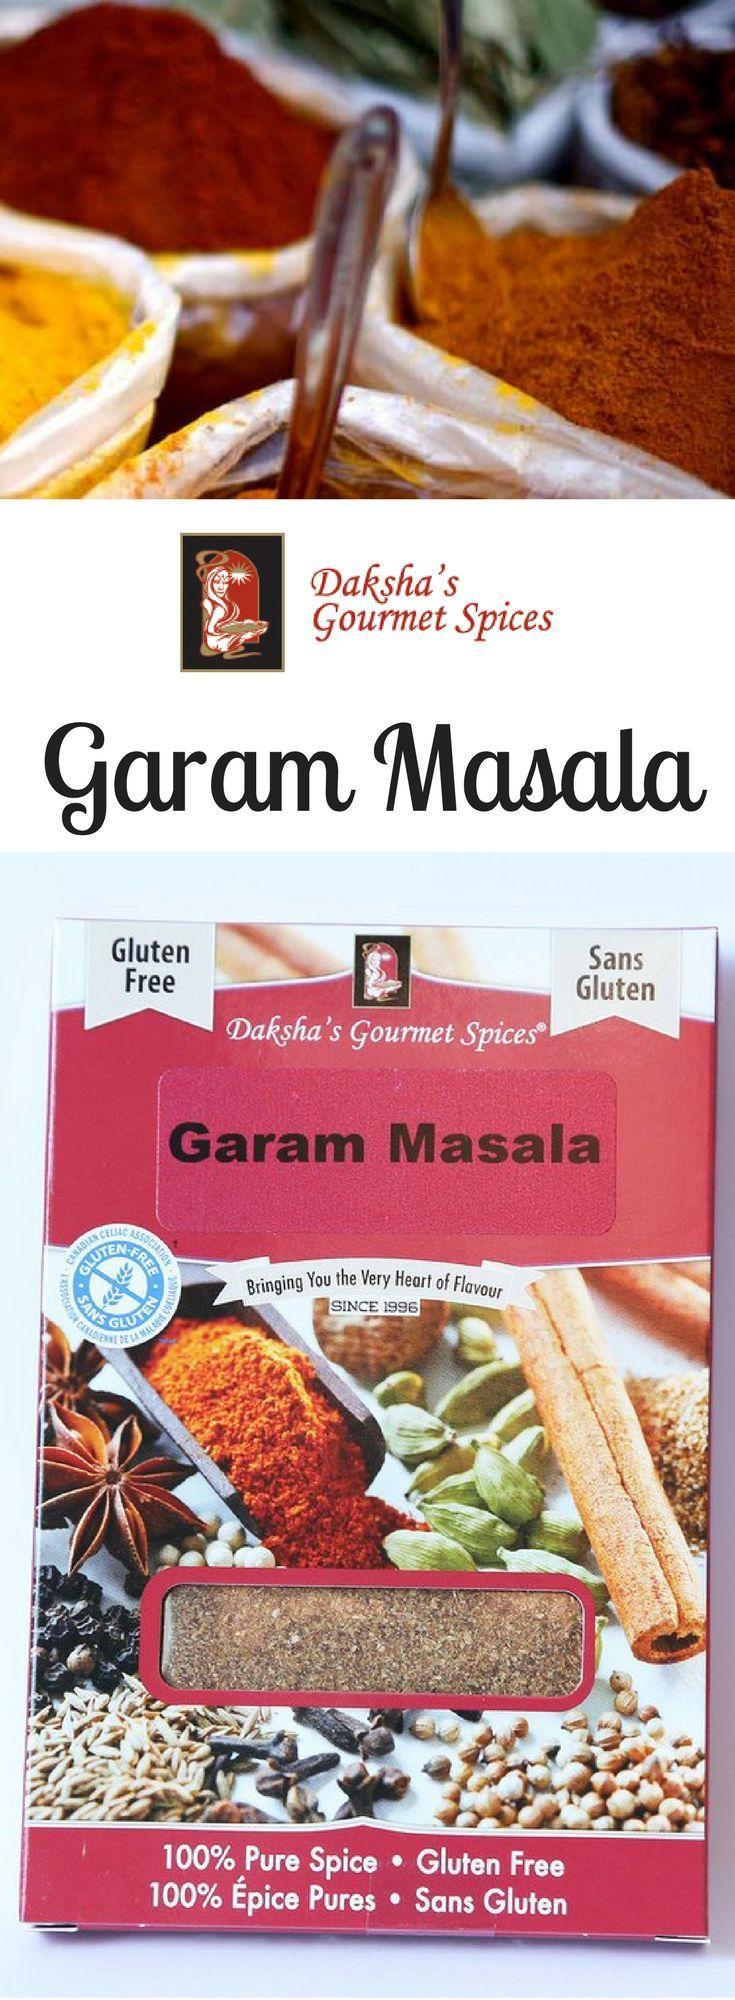 Daksha's Garam #Masala! Freshly ground traditional #IndianSpice blend used in many meat, lentil and vegetarian dishes.